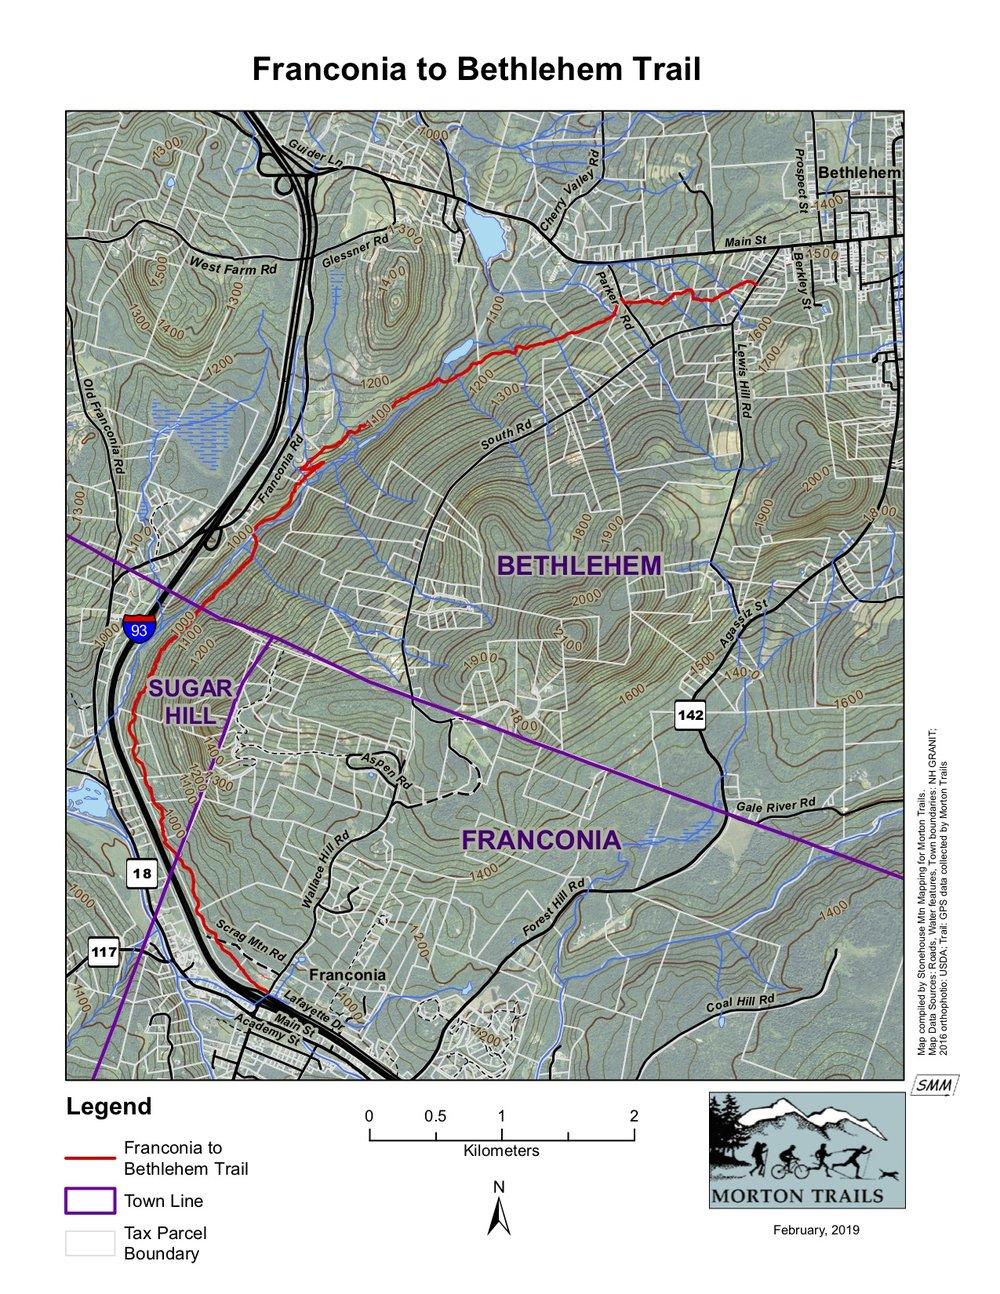 Franconia to Bethlehem Trail